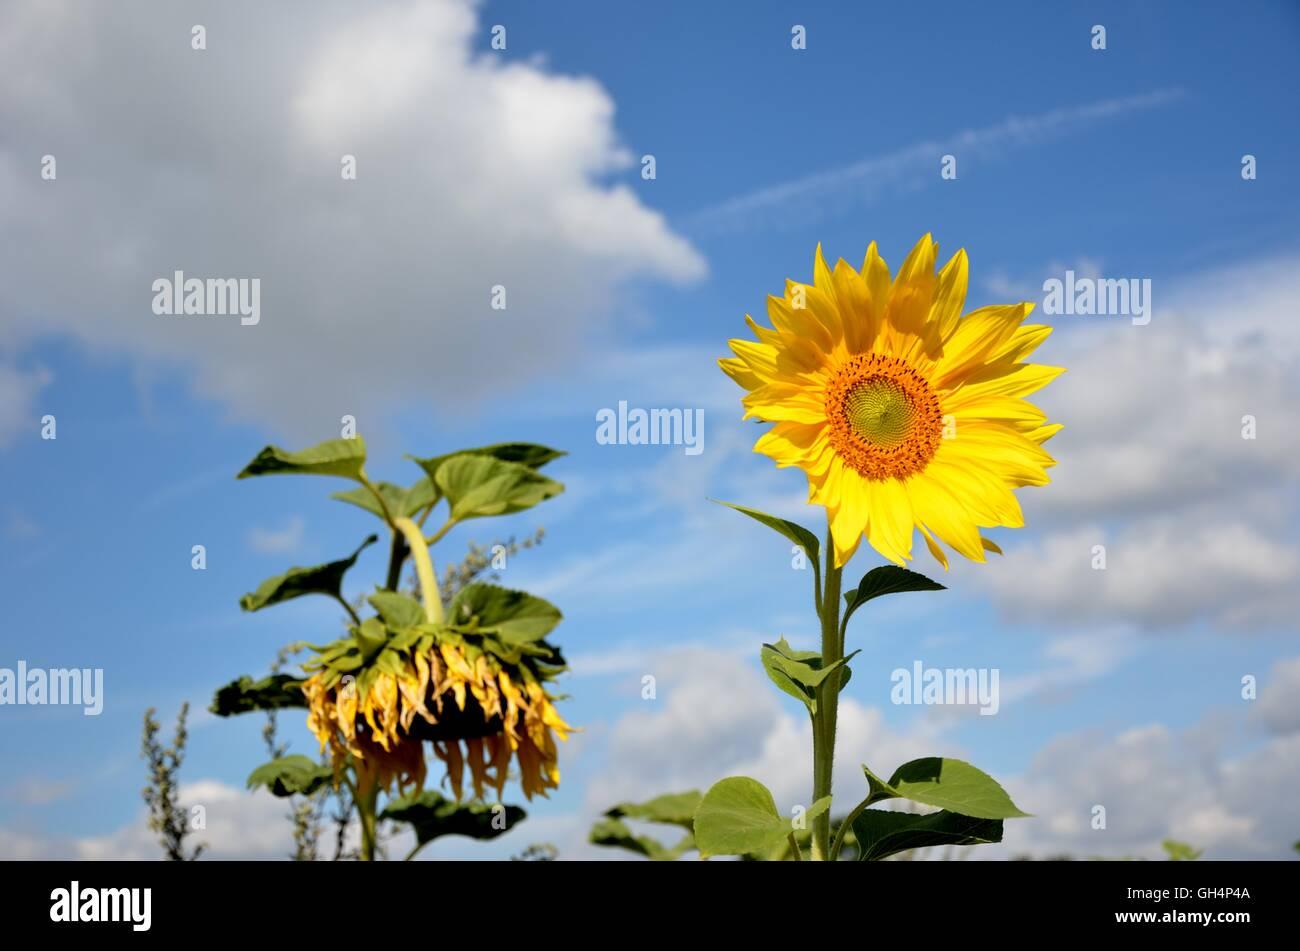 Sunflower Dead Stock Photos & Sunflower Dead Stock Images - Alamy